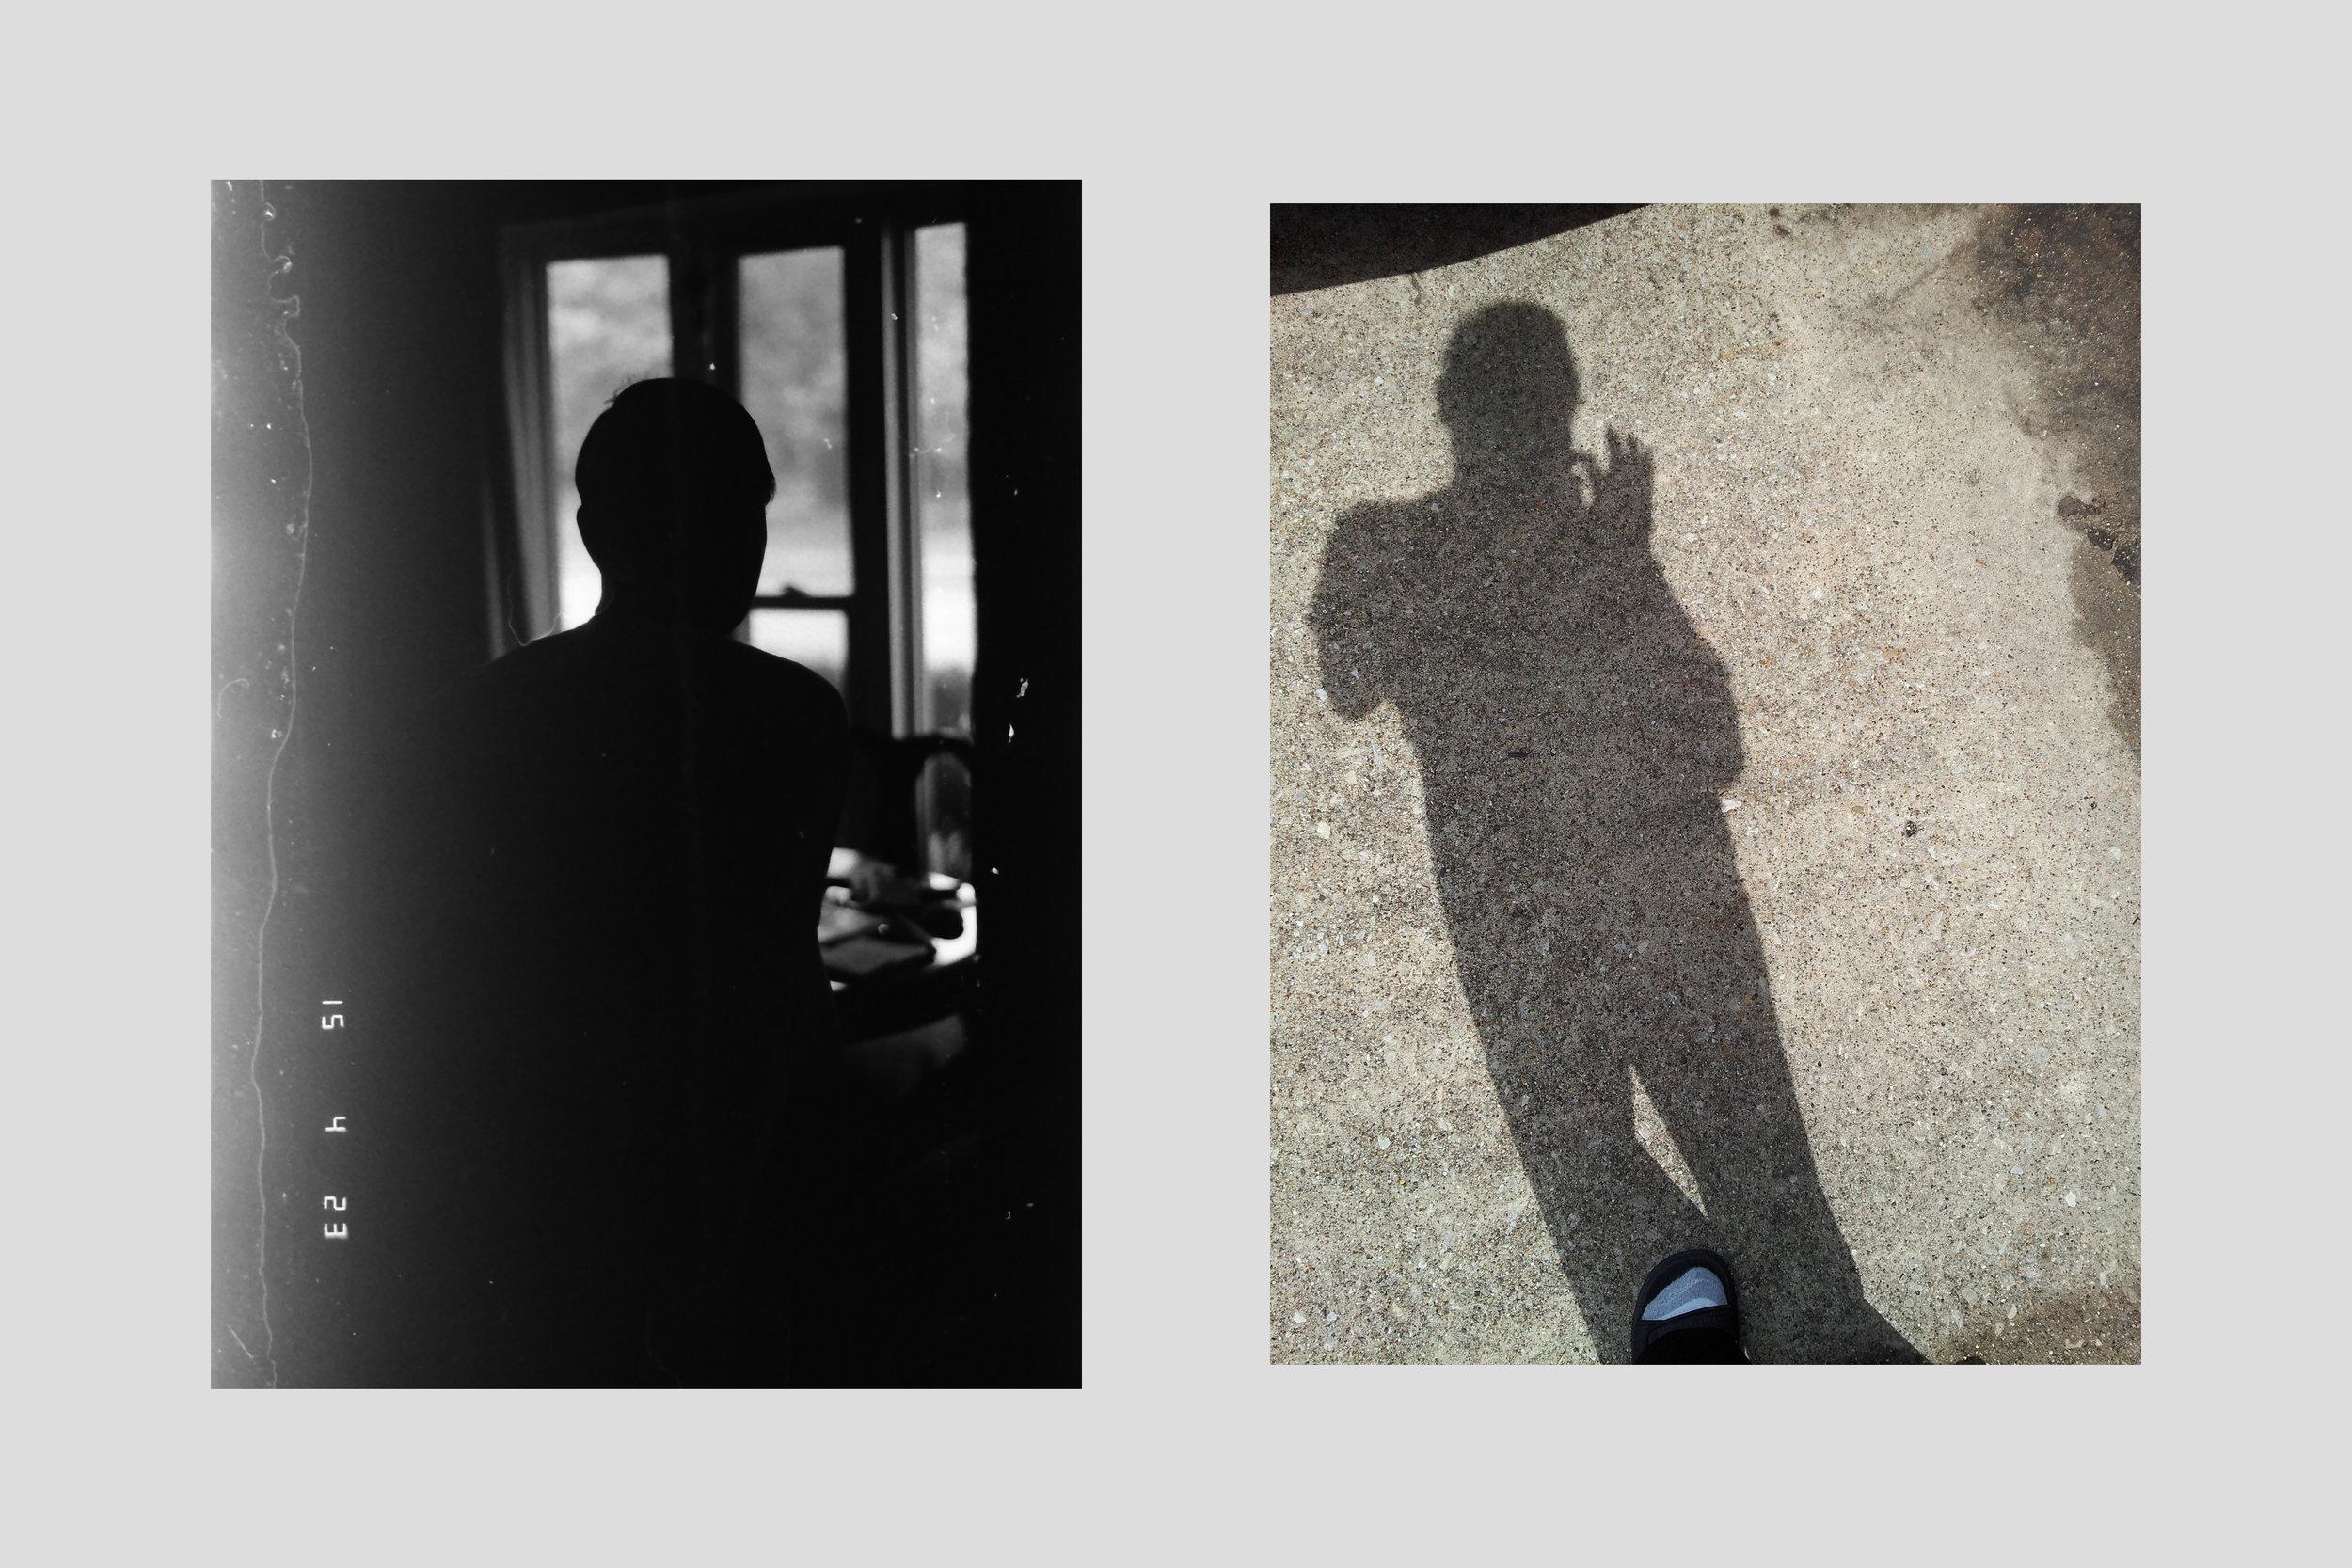 73_Perspective_3.jpg